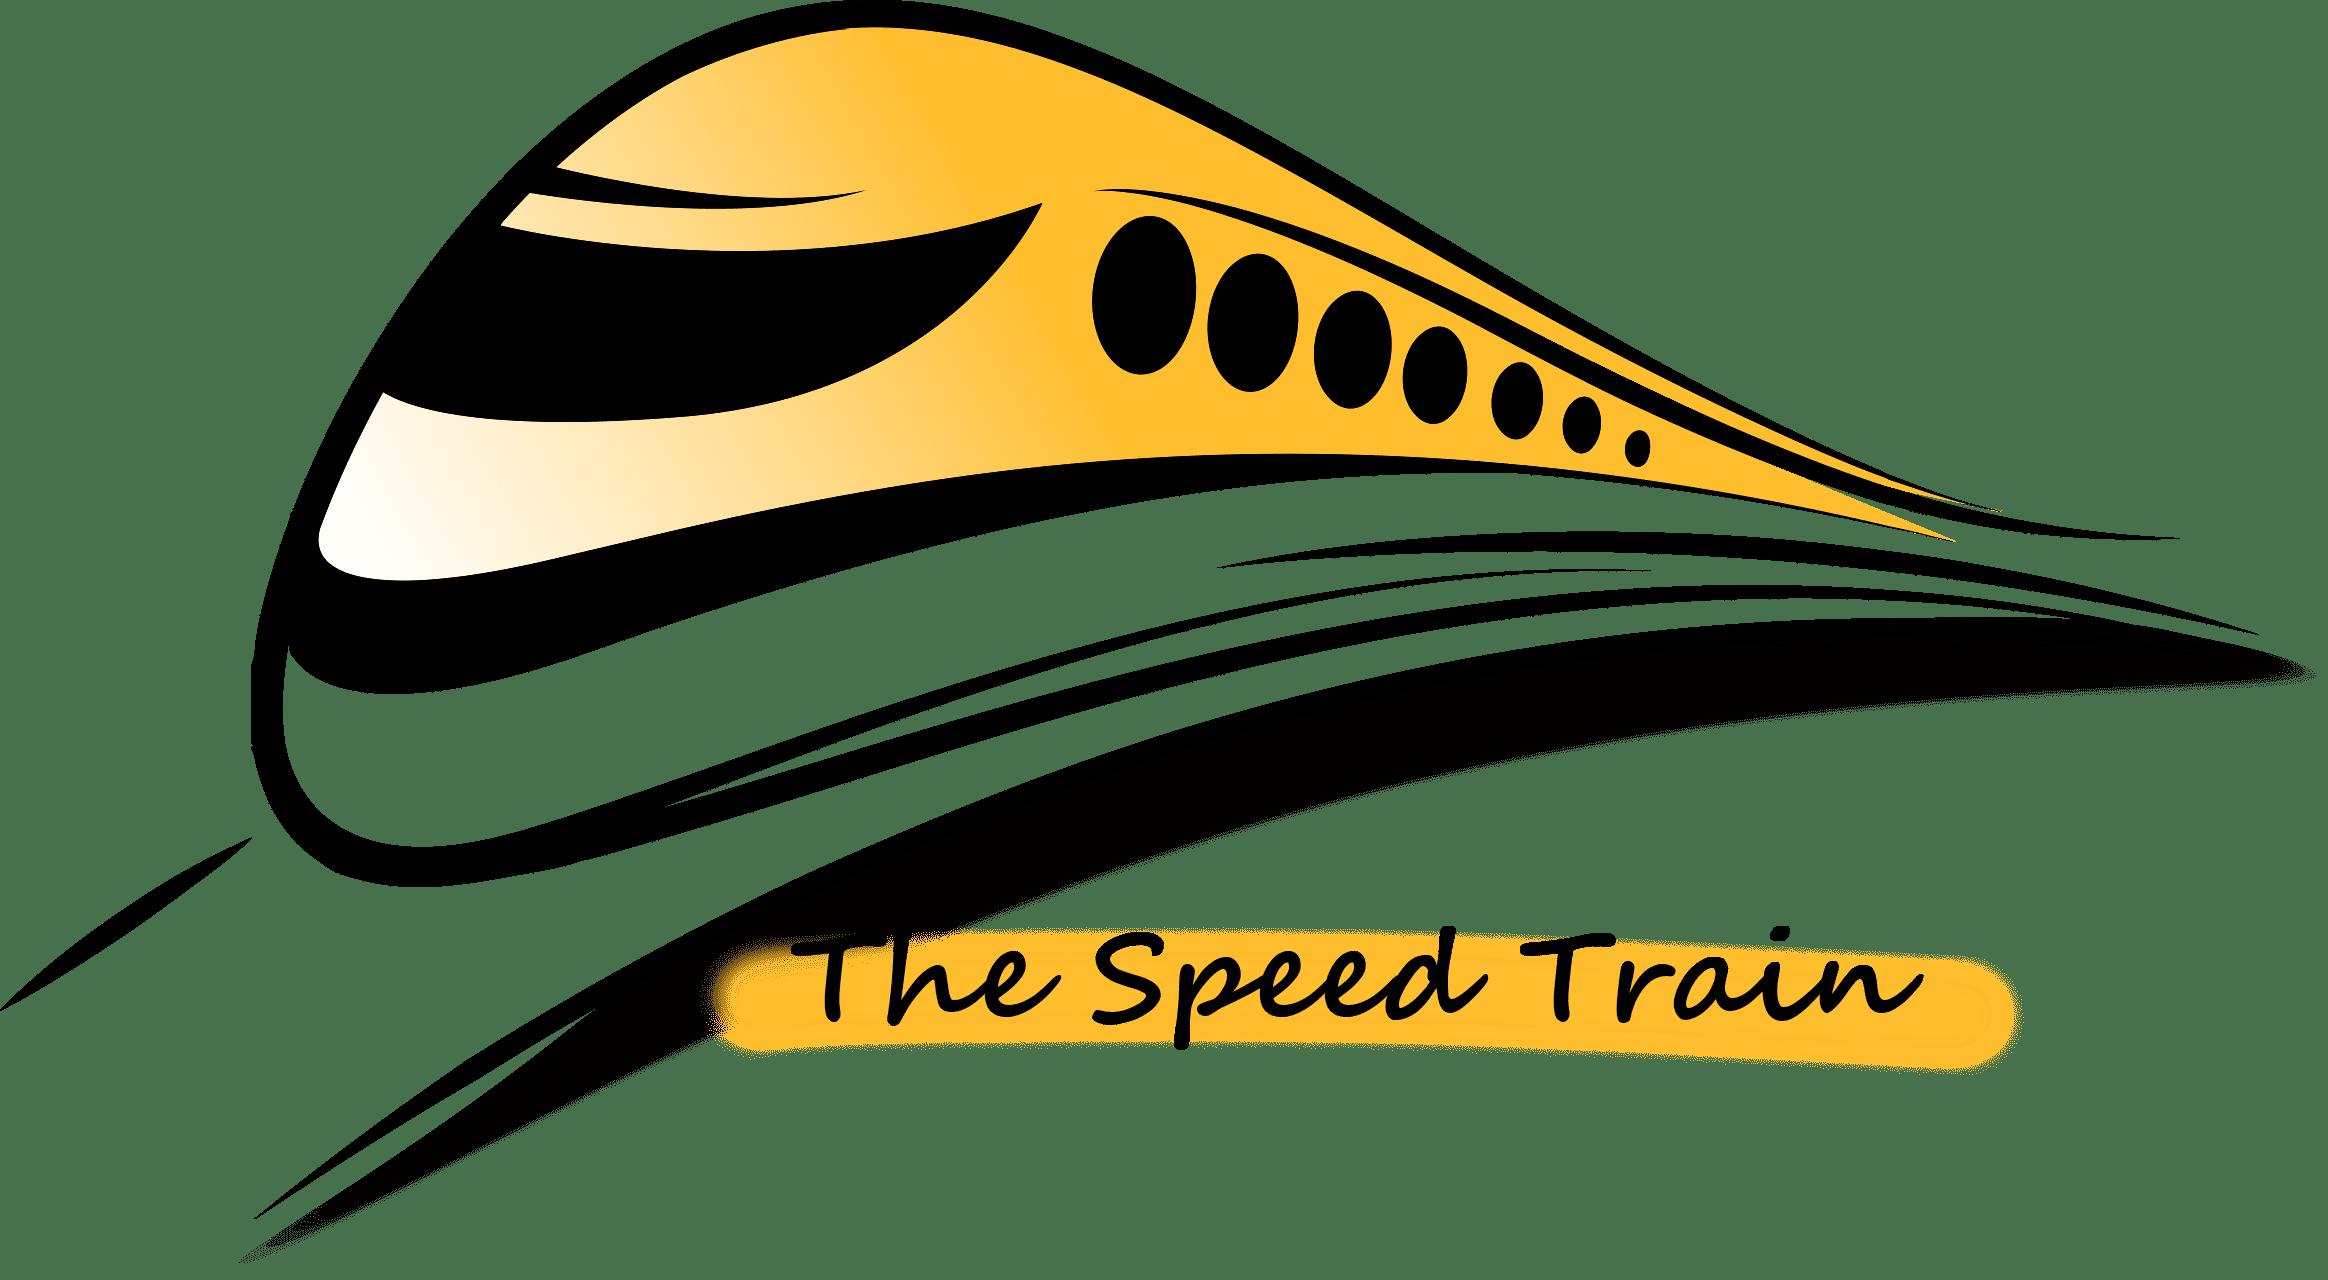 The Speed Train logo